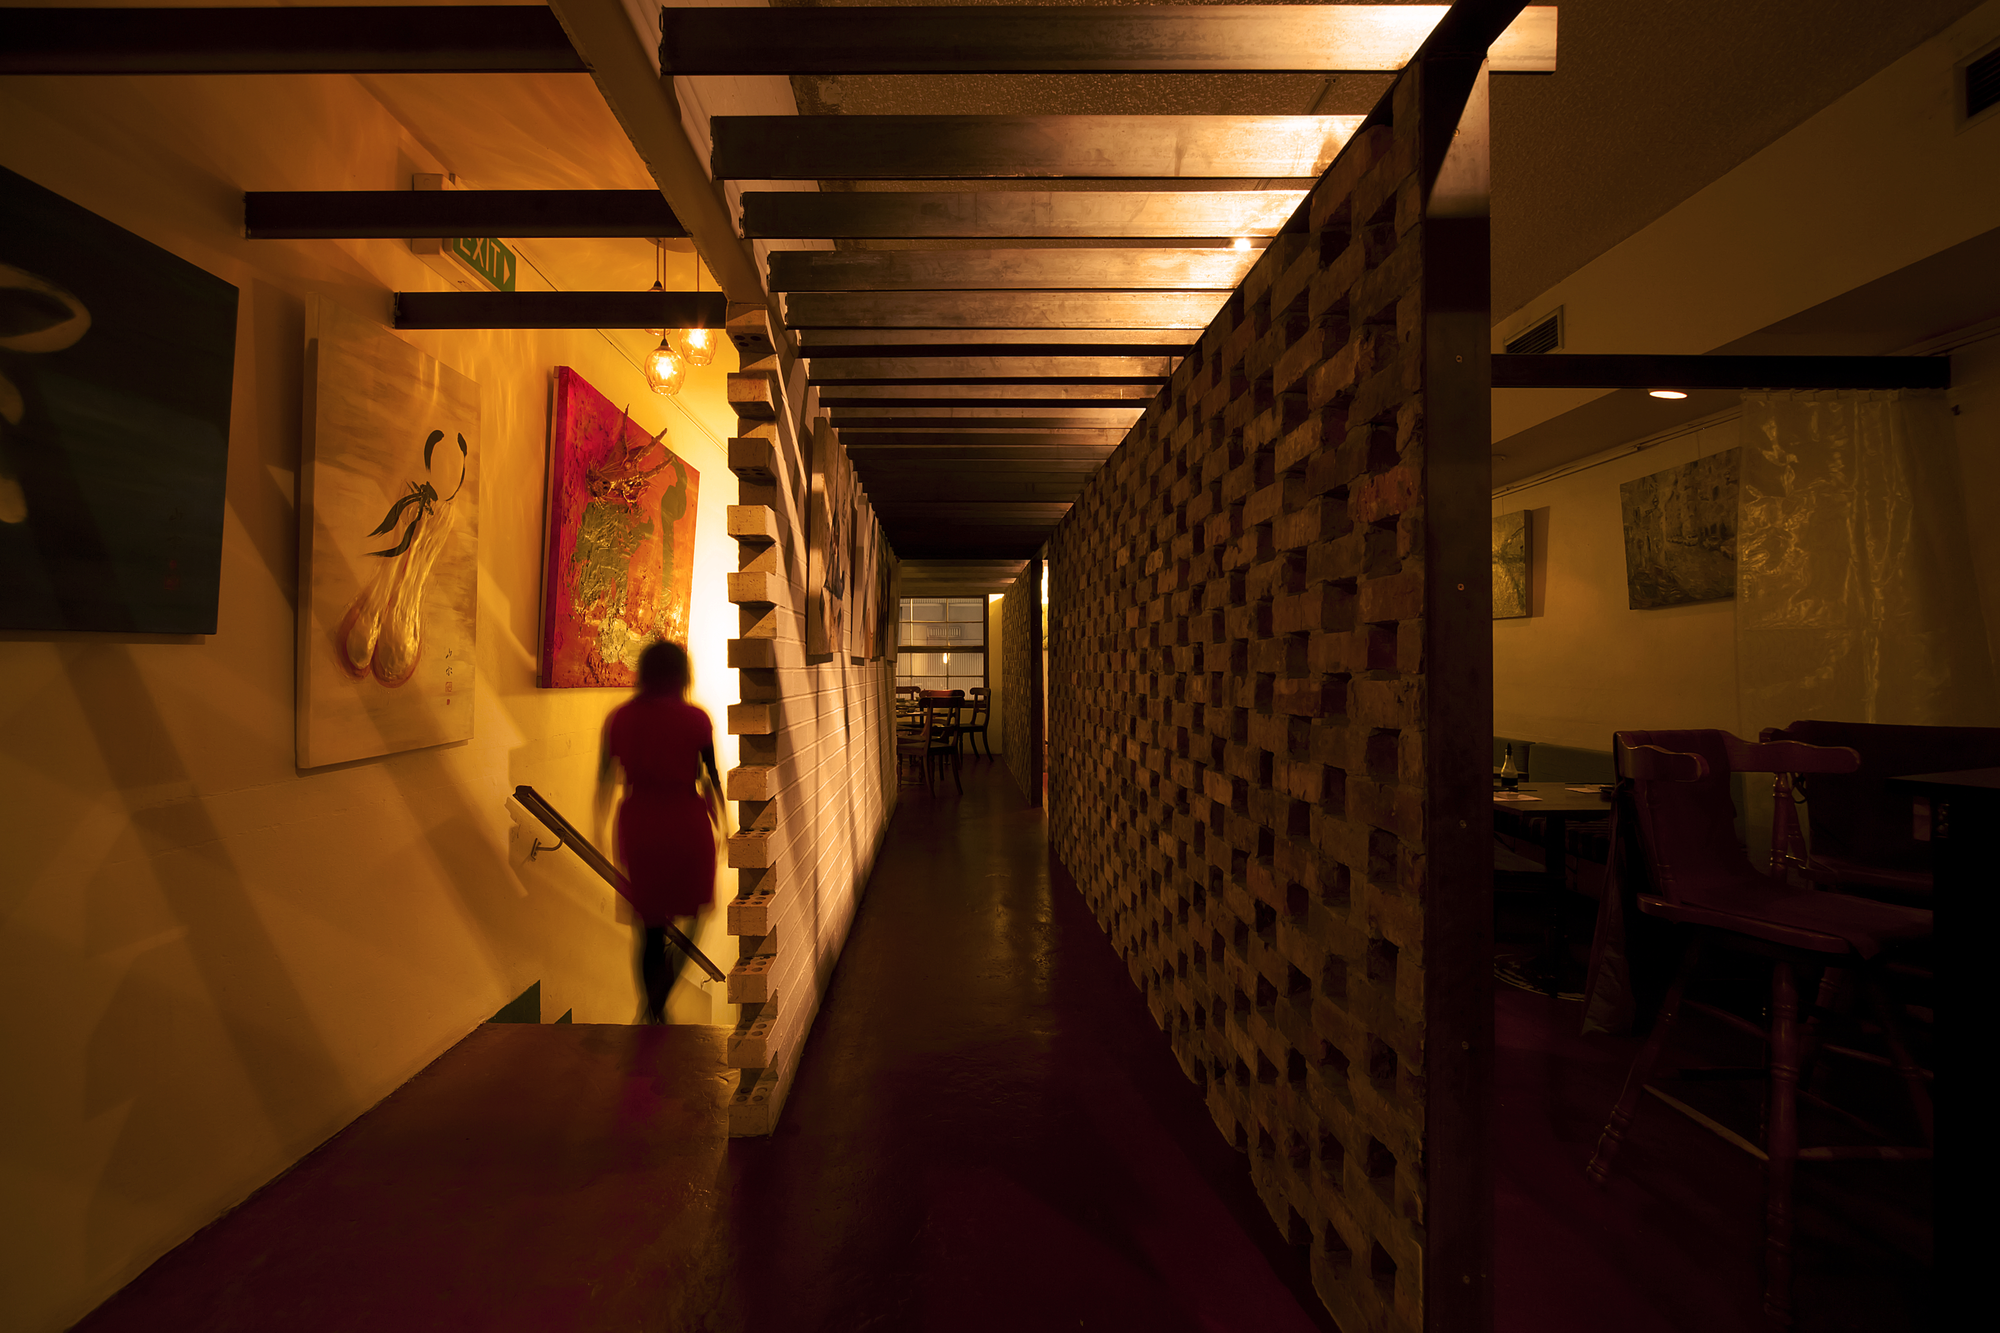 Uchi Lounge 02 / Facet Studio, © Andrew Chung